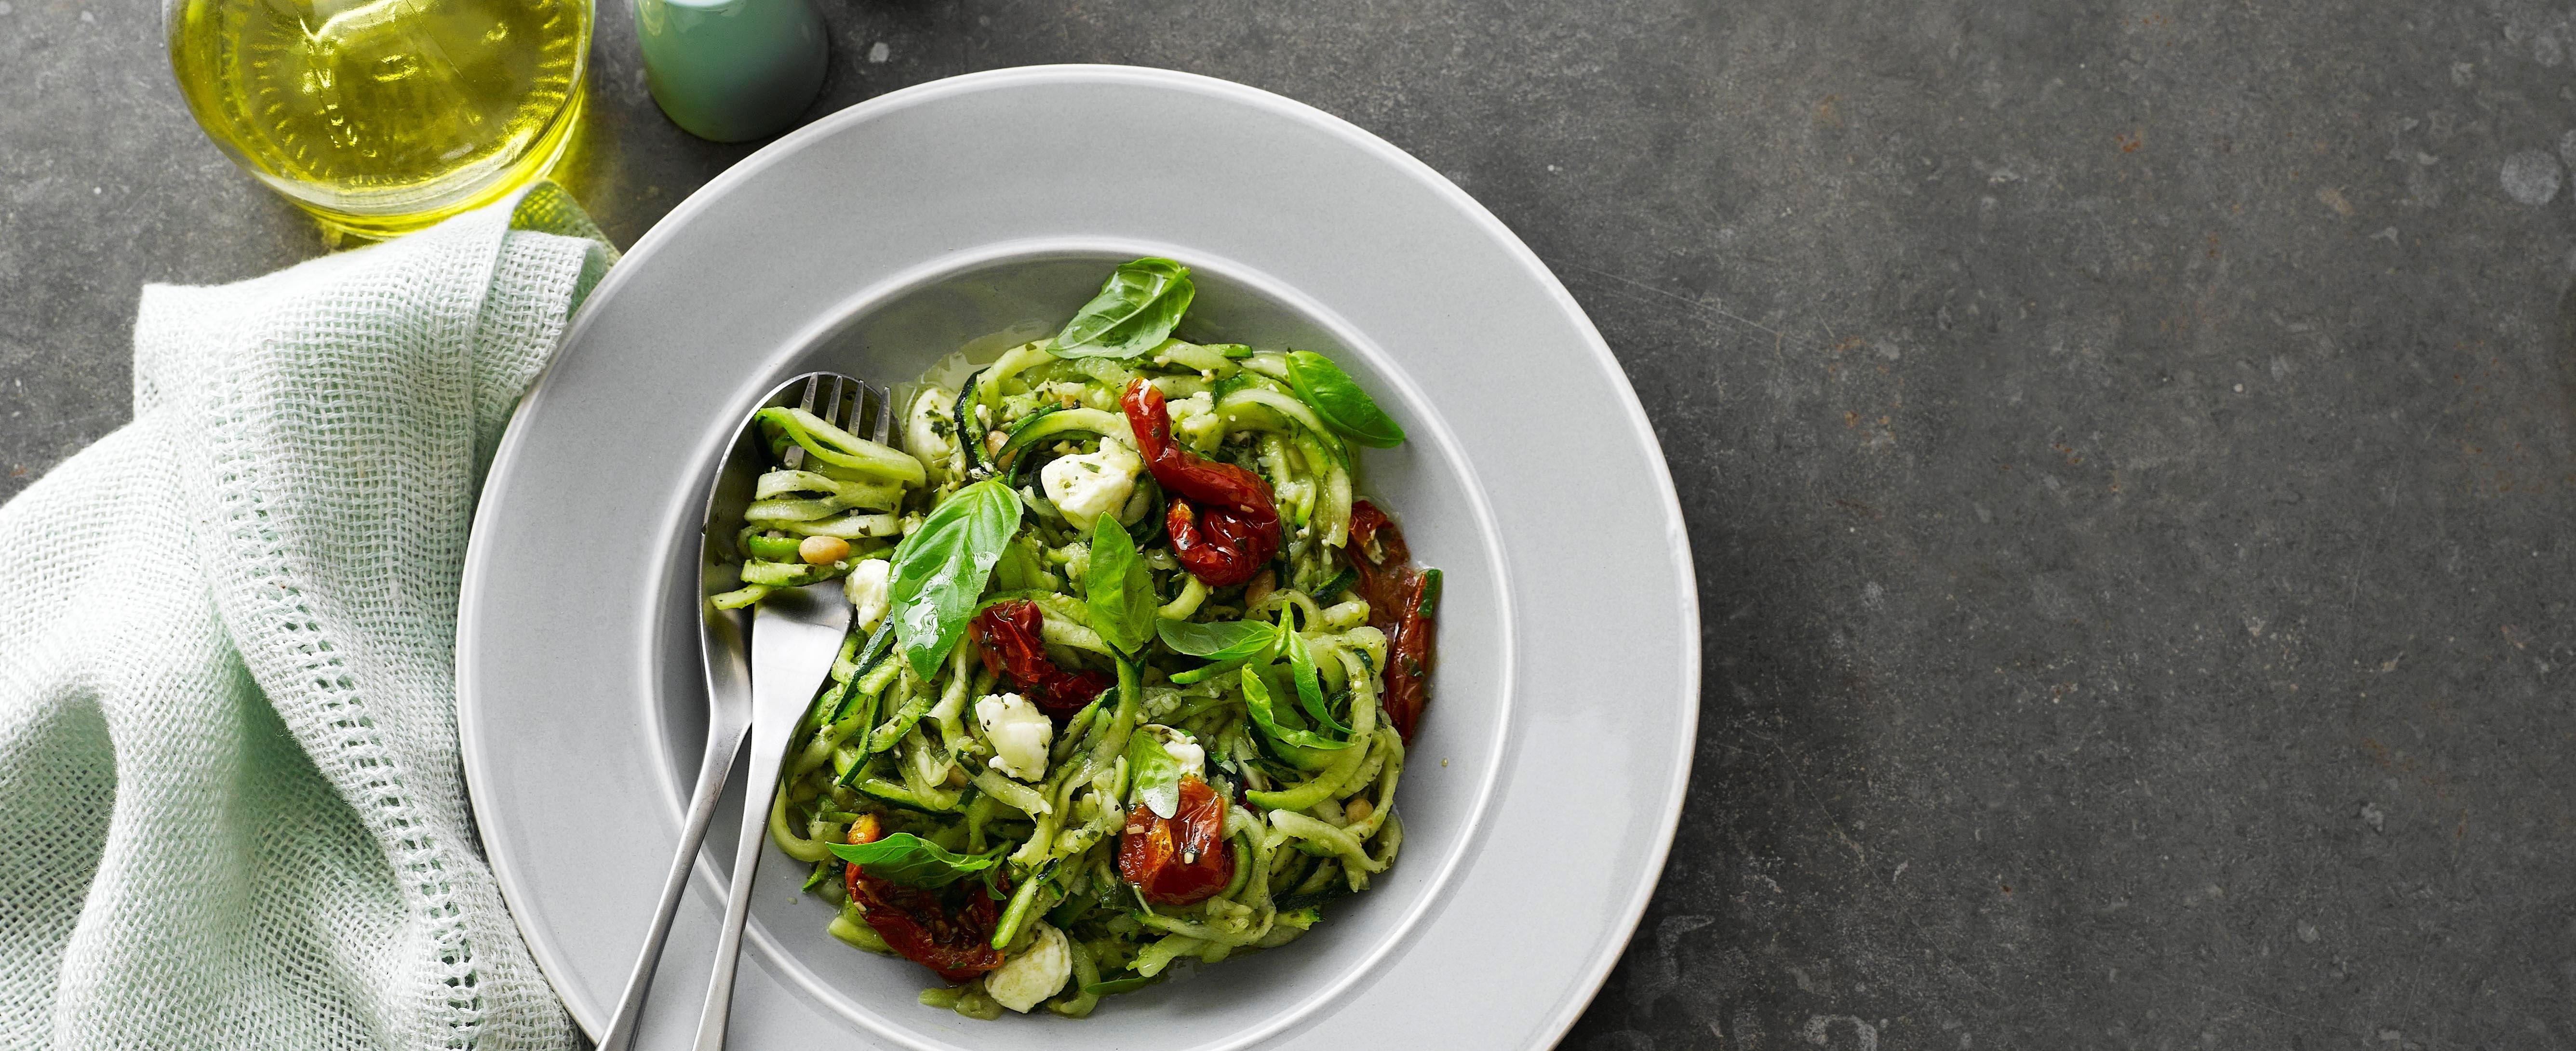 Spiralizer Recipes - courgetti